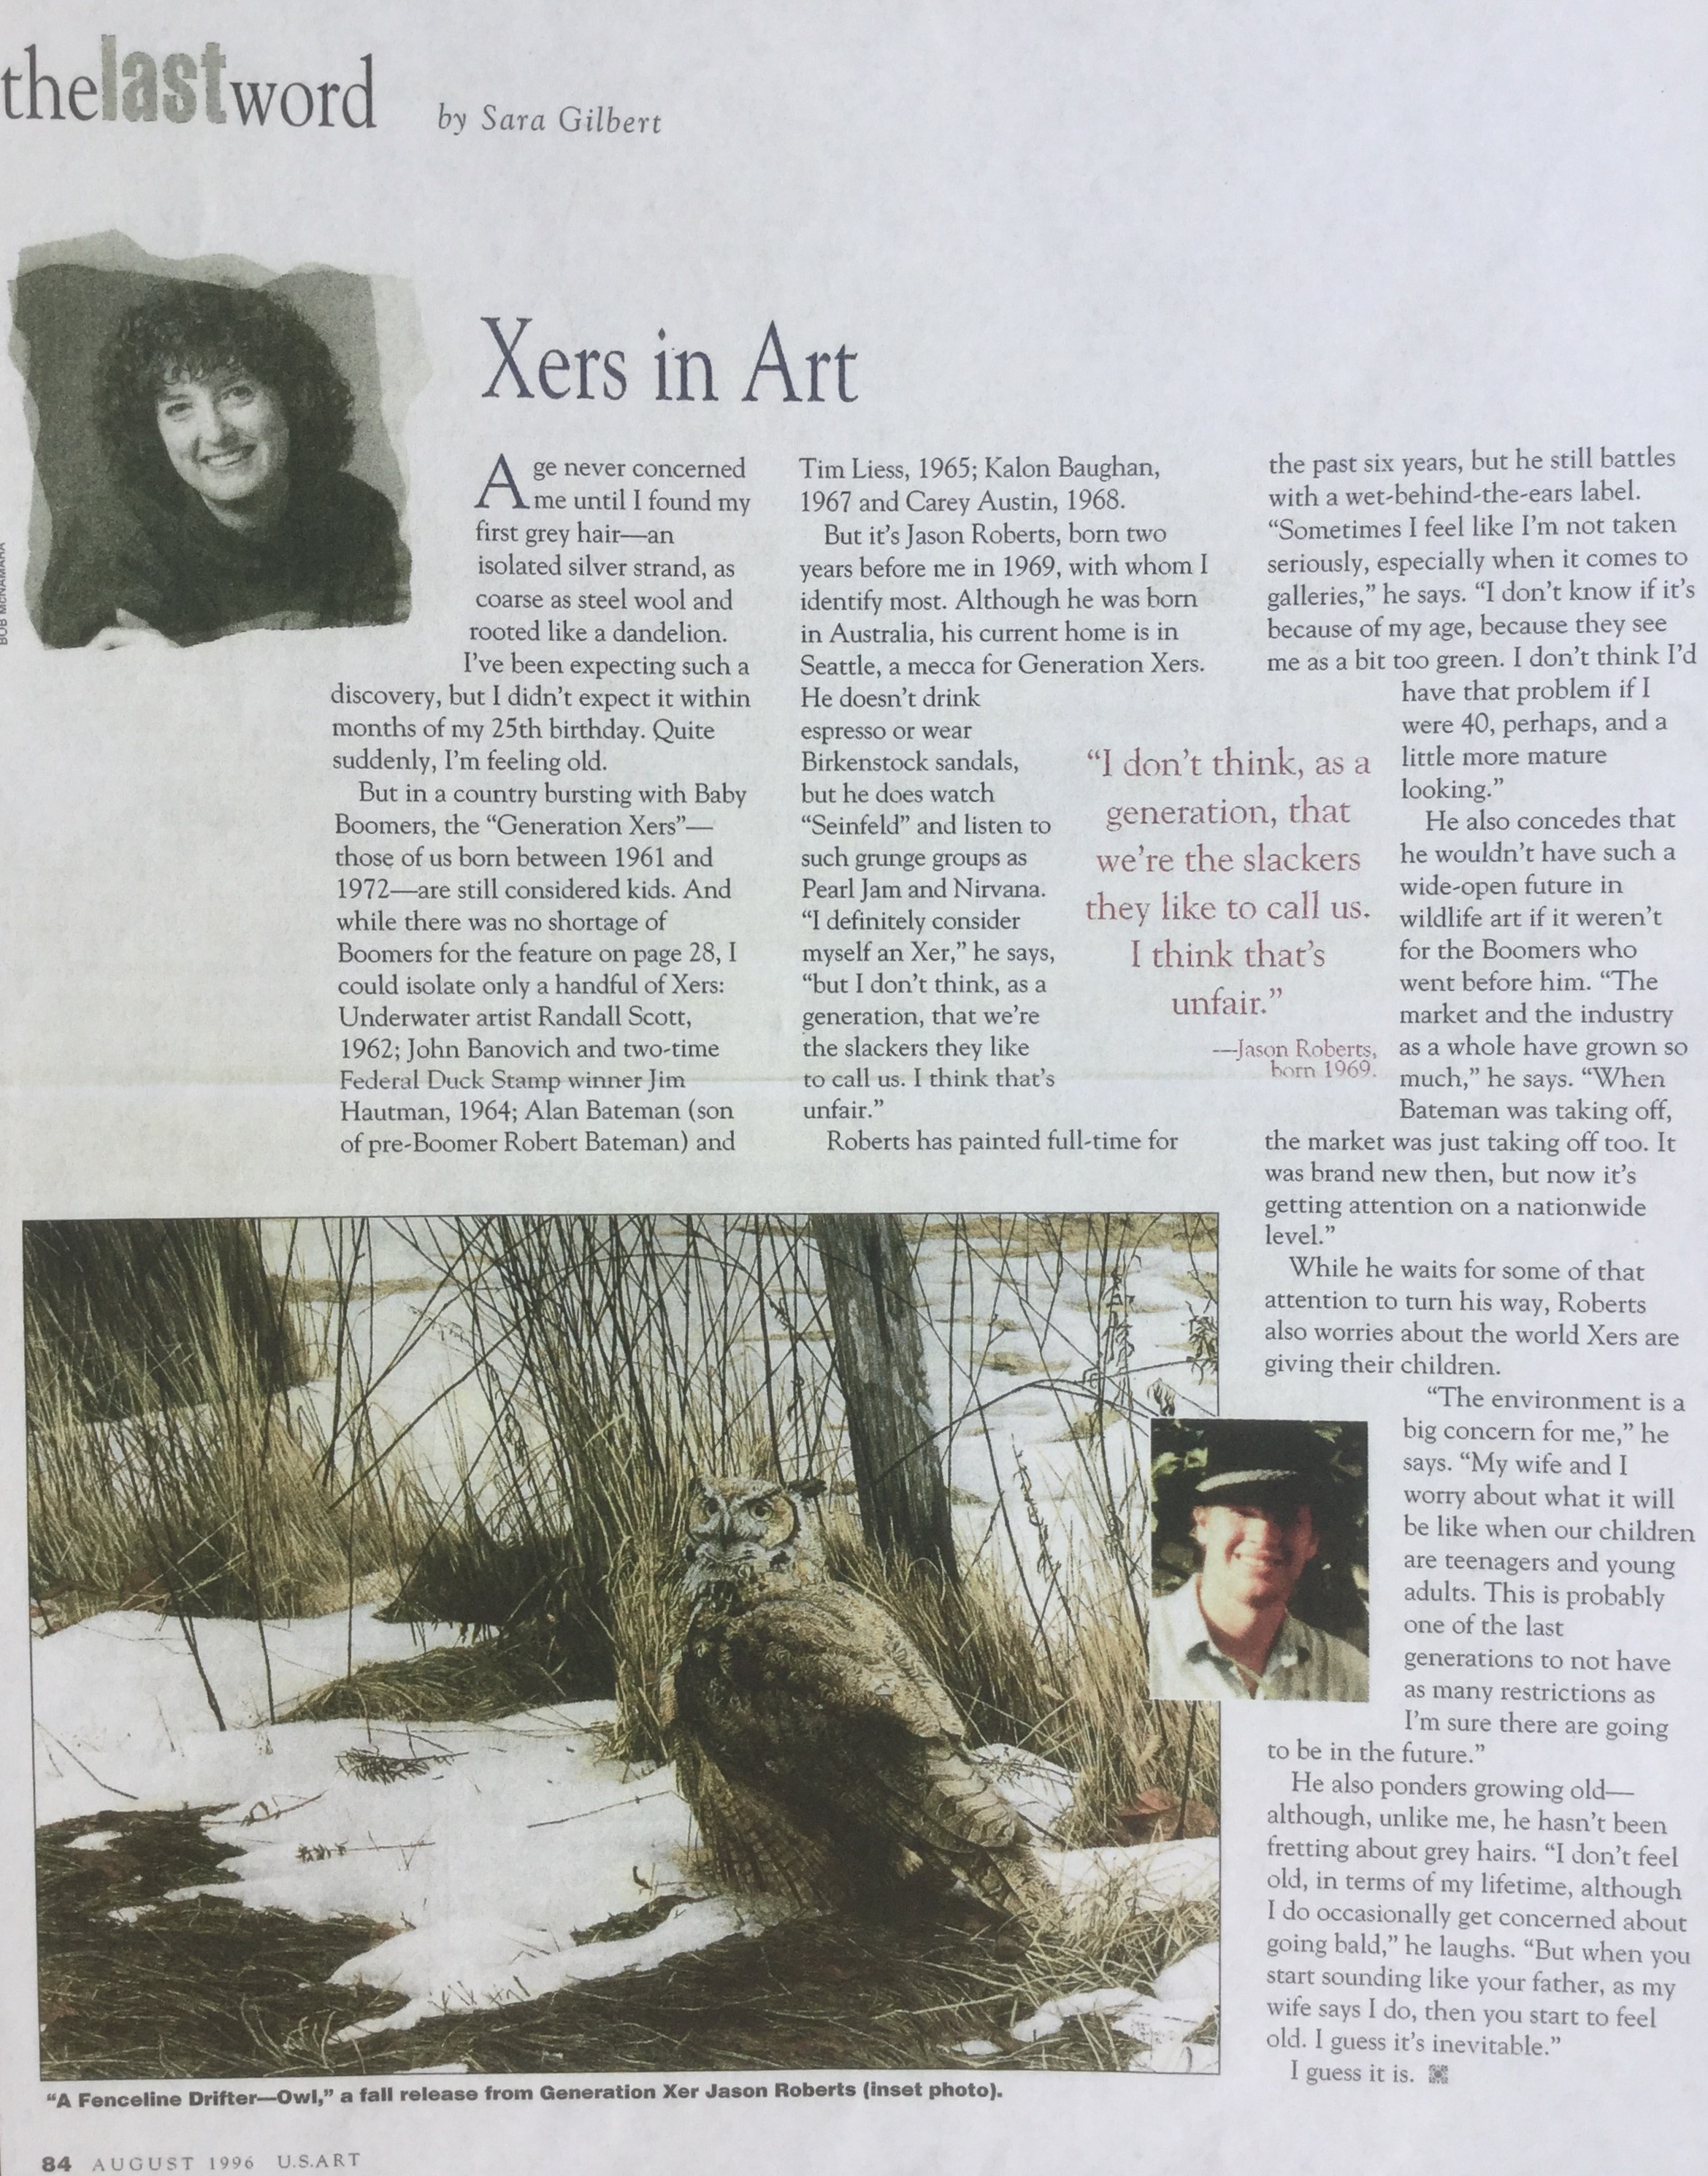 USArt (USA )August 1996